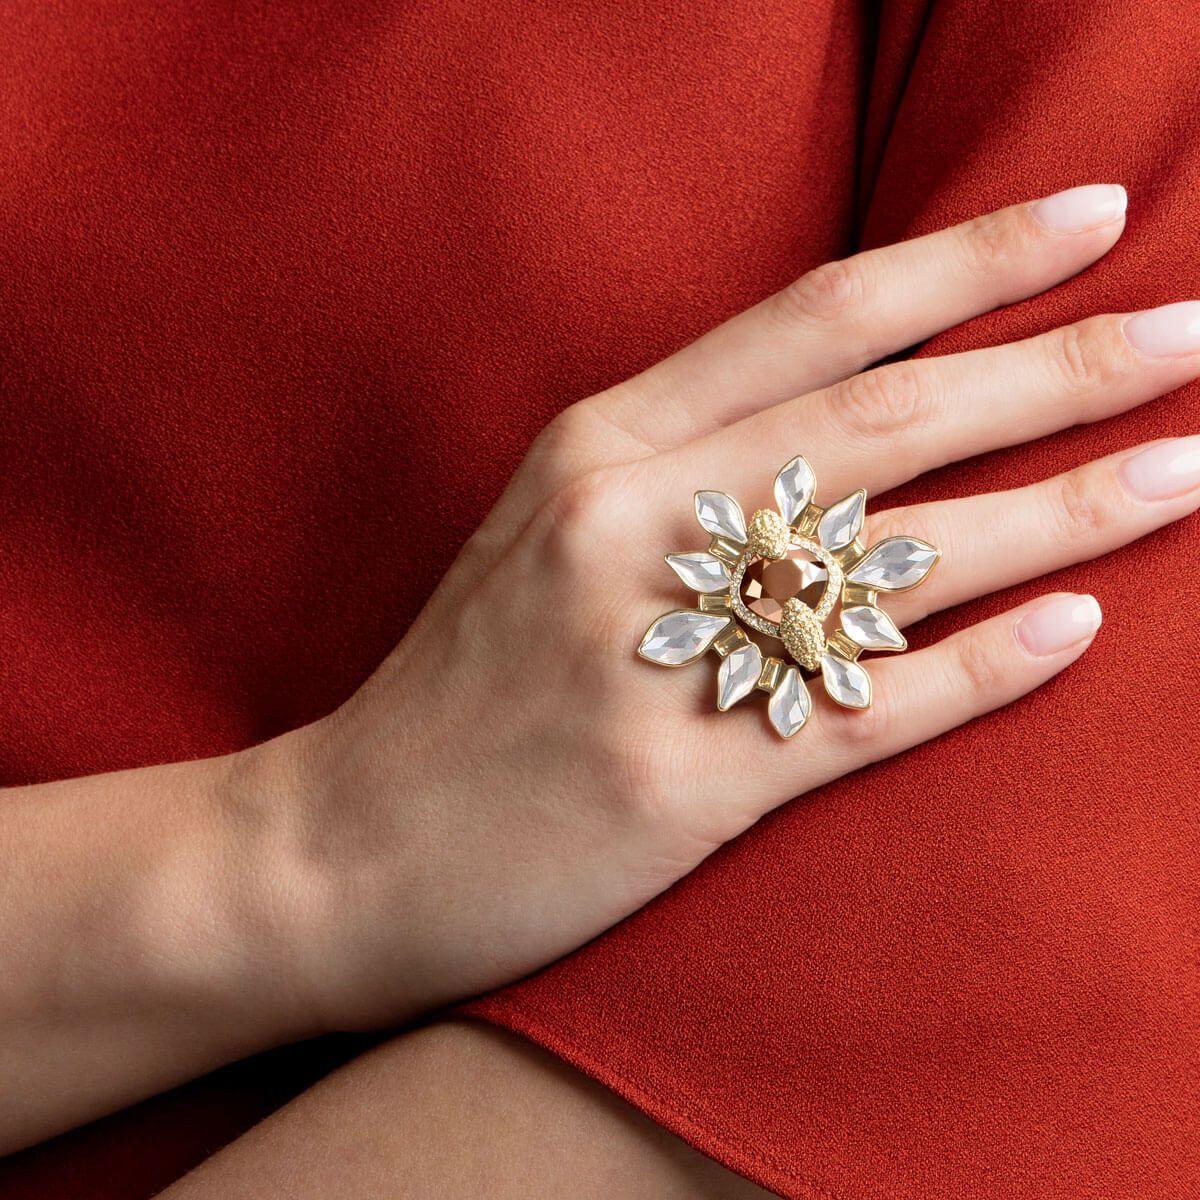 Odysseia Motif Ring Multi Coloured Gold Tone Plated Swarovski Gifts Swarovski Gold Tones